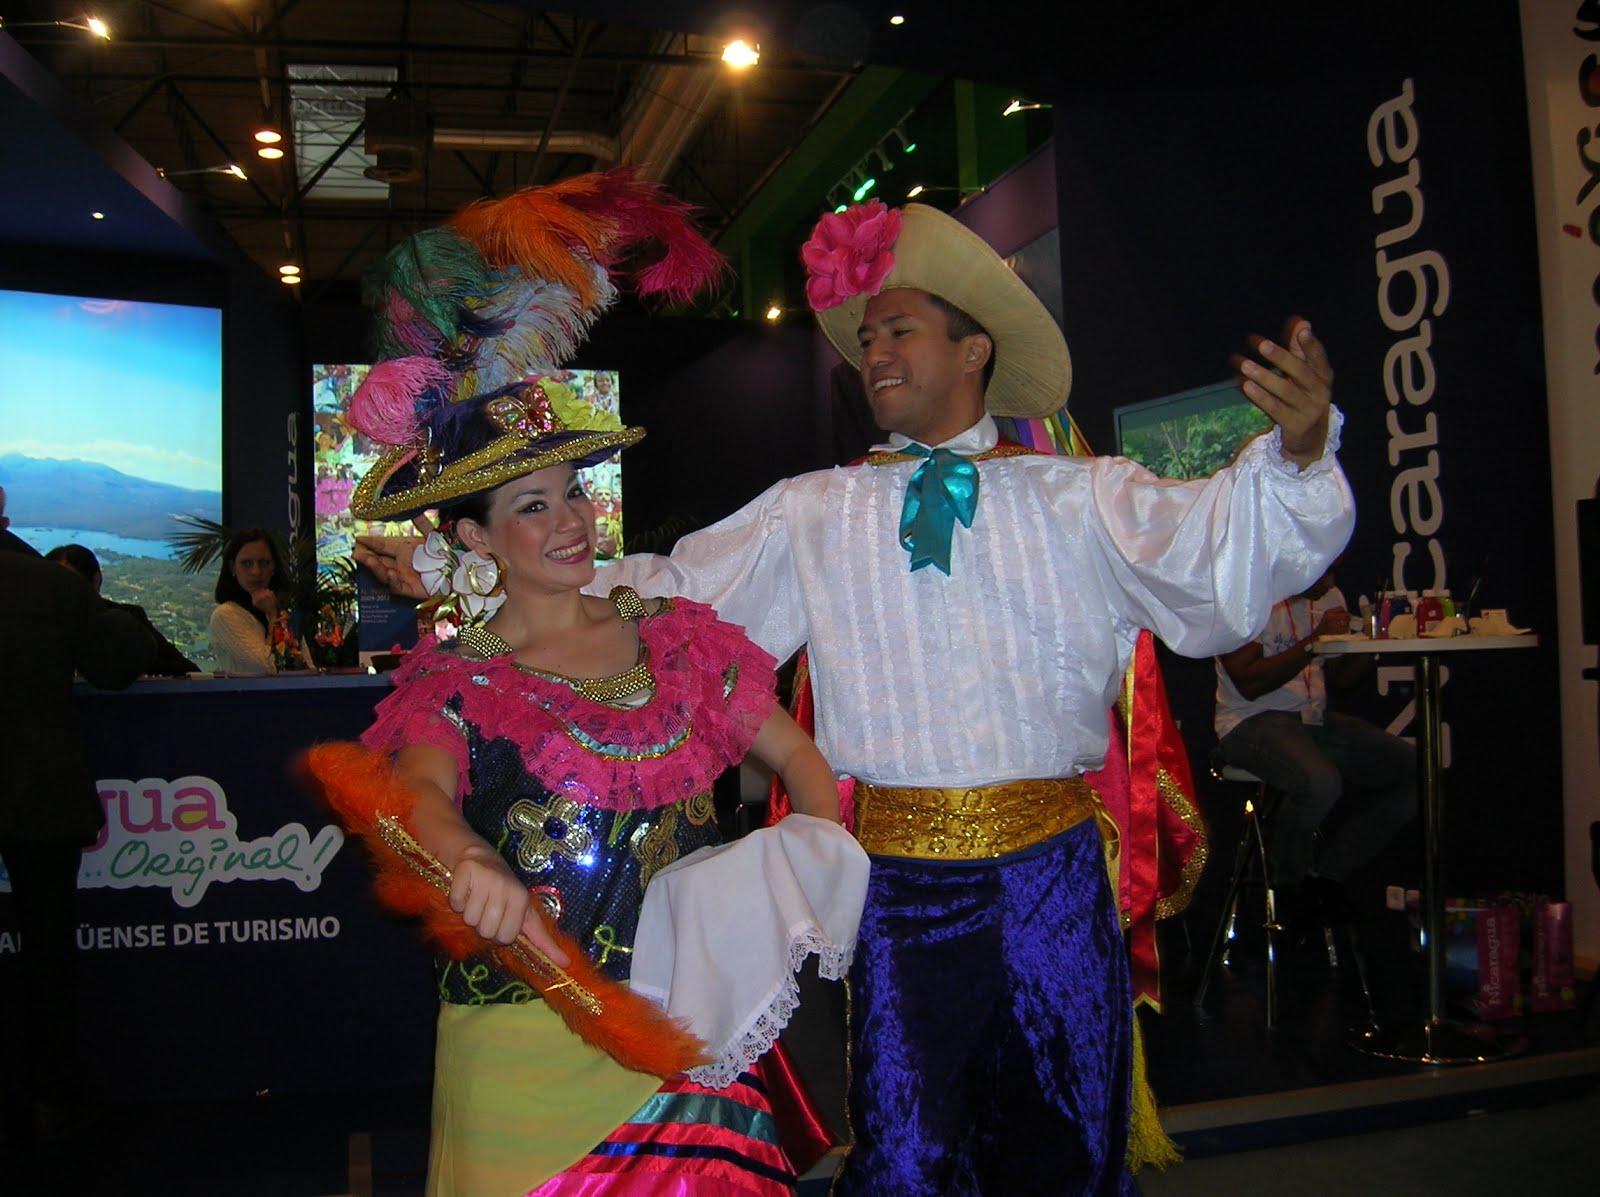 Fitur, stand Nicaragua, Nicaragua, vuelta al mundo, round the world, La vuelta al mundo de Asun y Ricardo